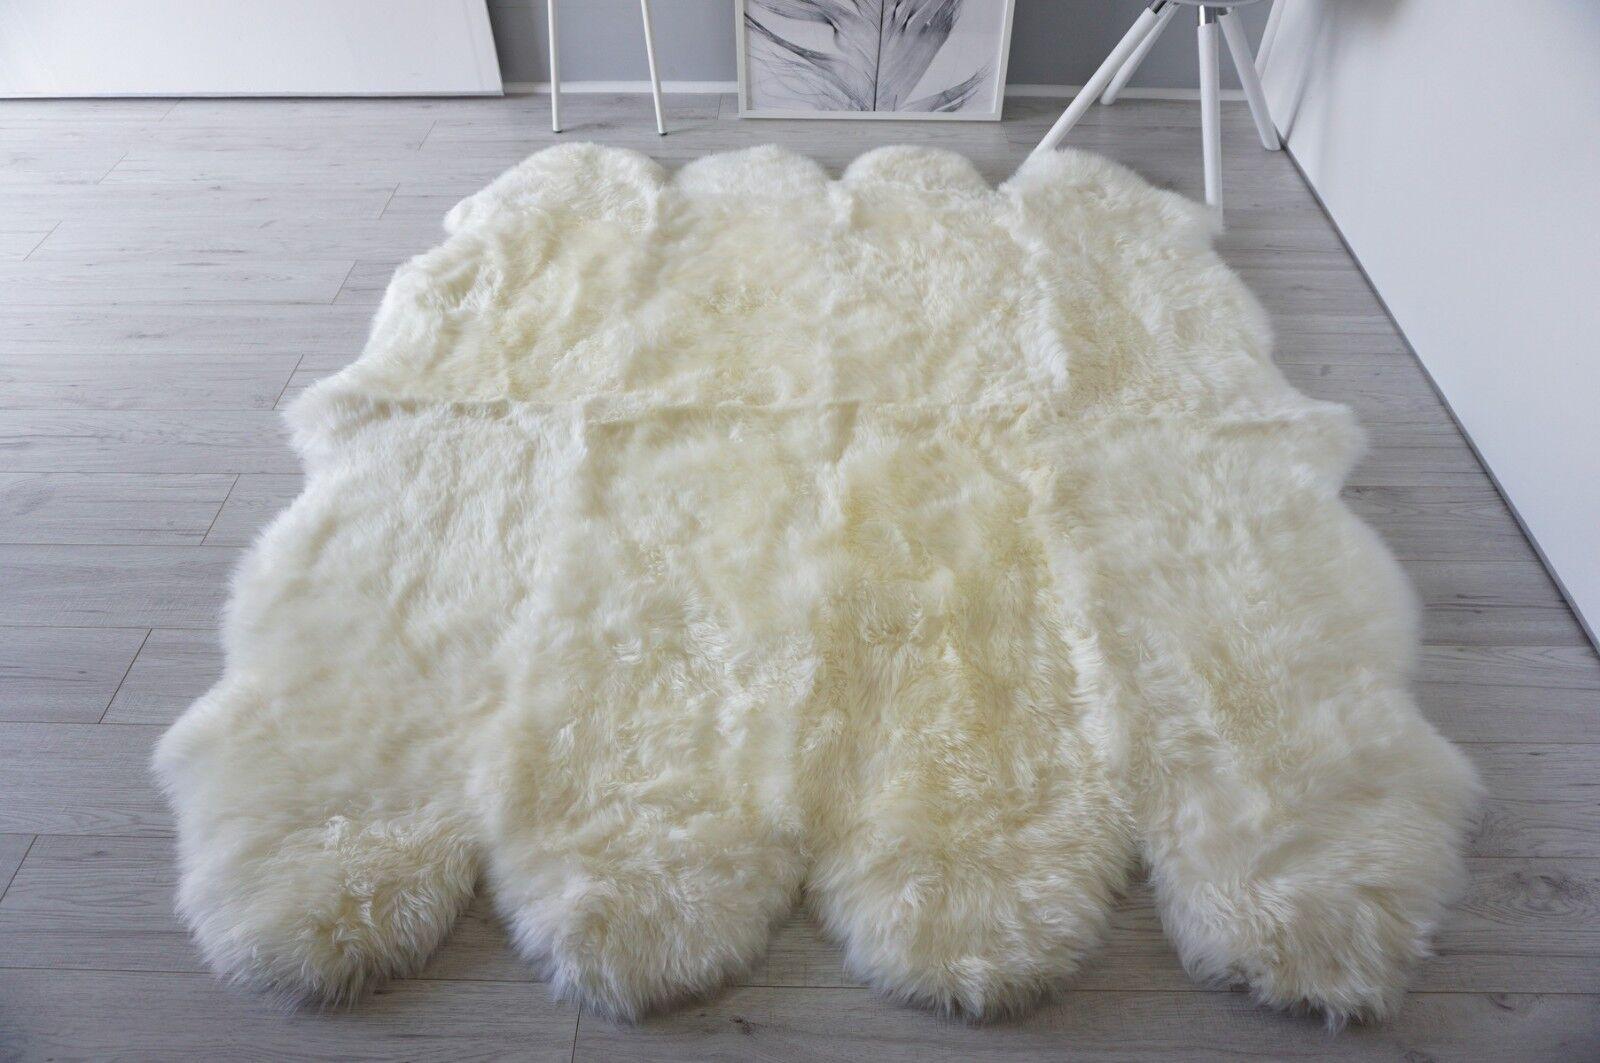 Genuine Australian Australian Australian Octo (8) Sheepskin Rug - Super Soft Silky Cream Weiß Wool 1c8ce2